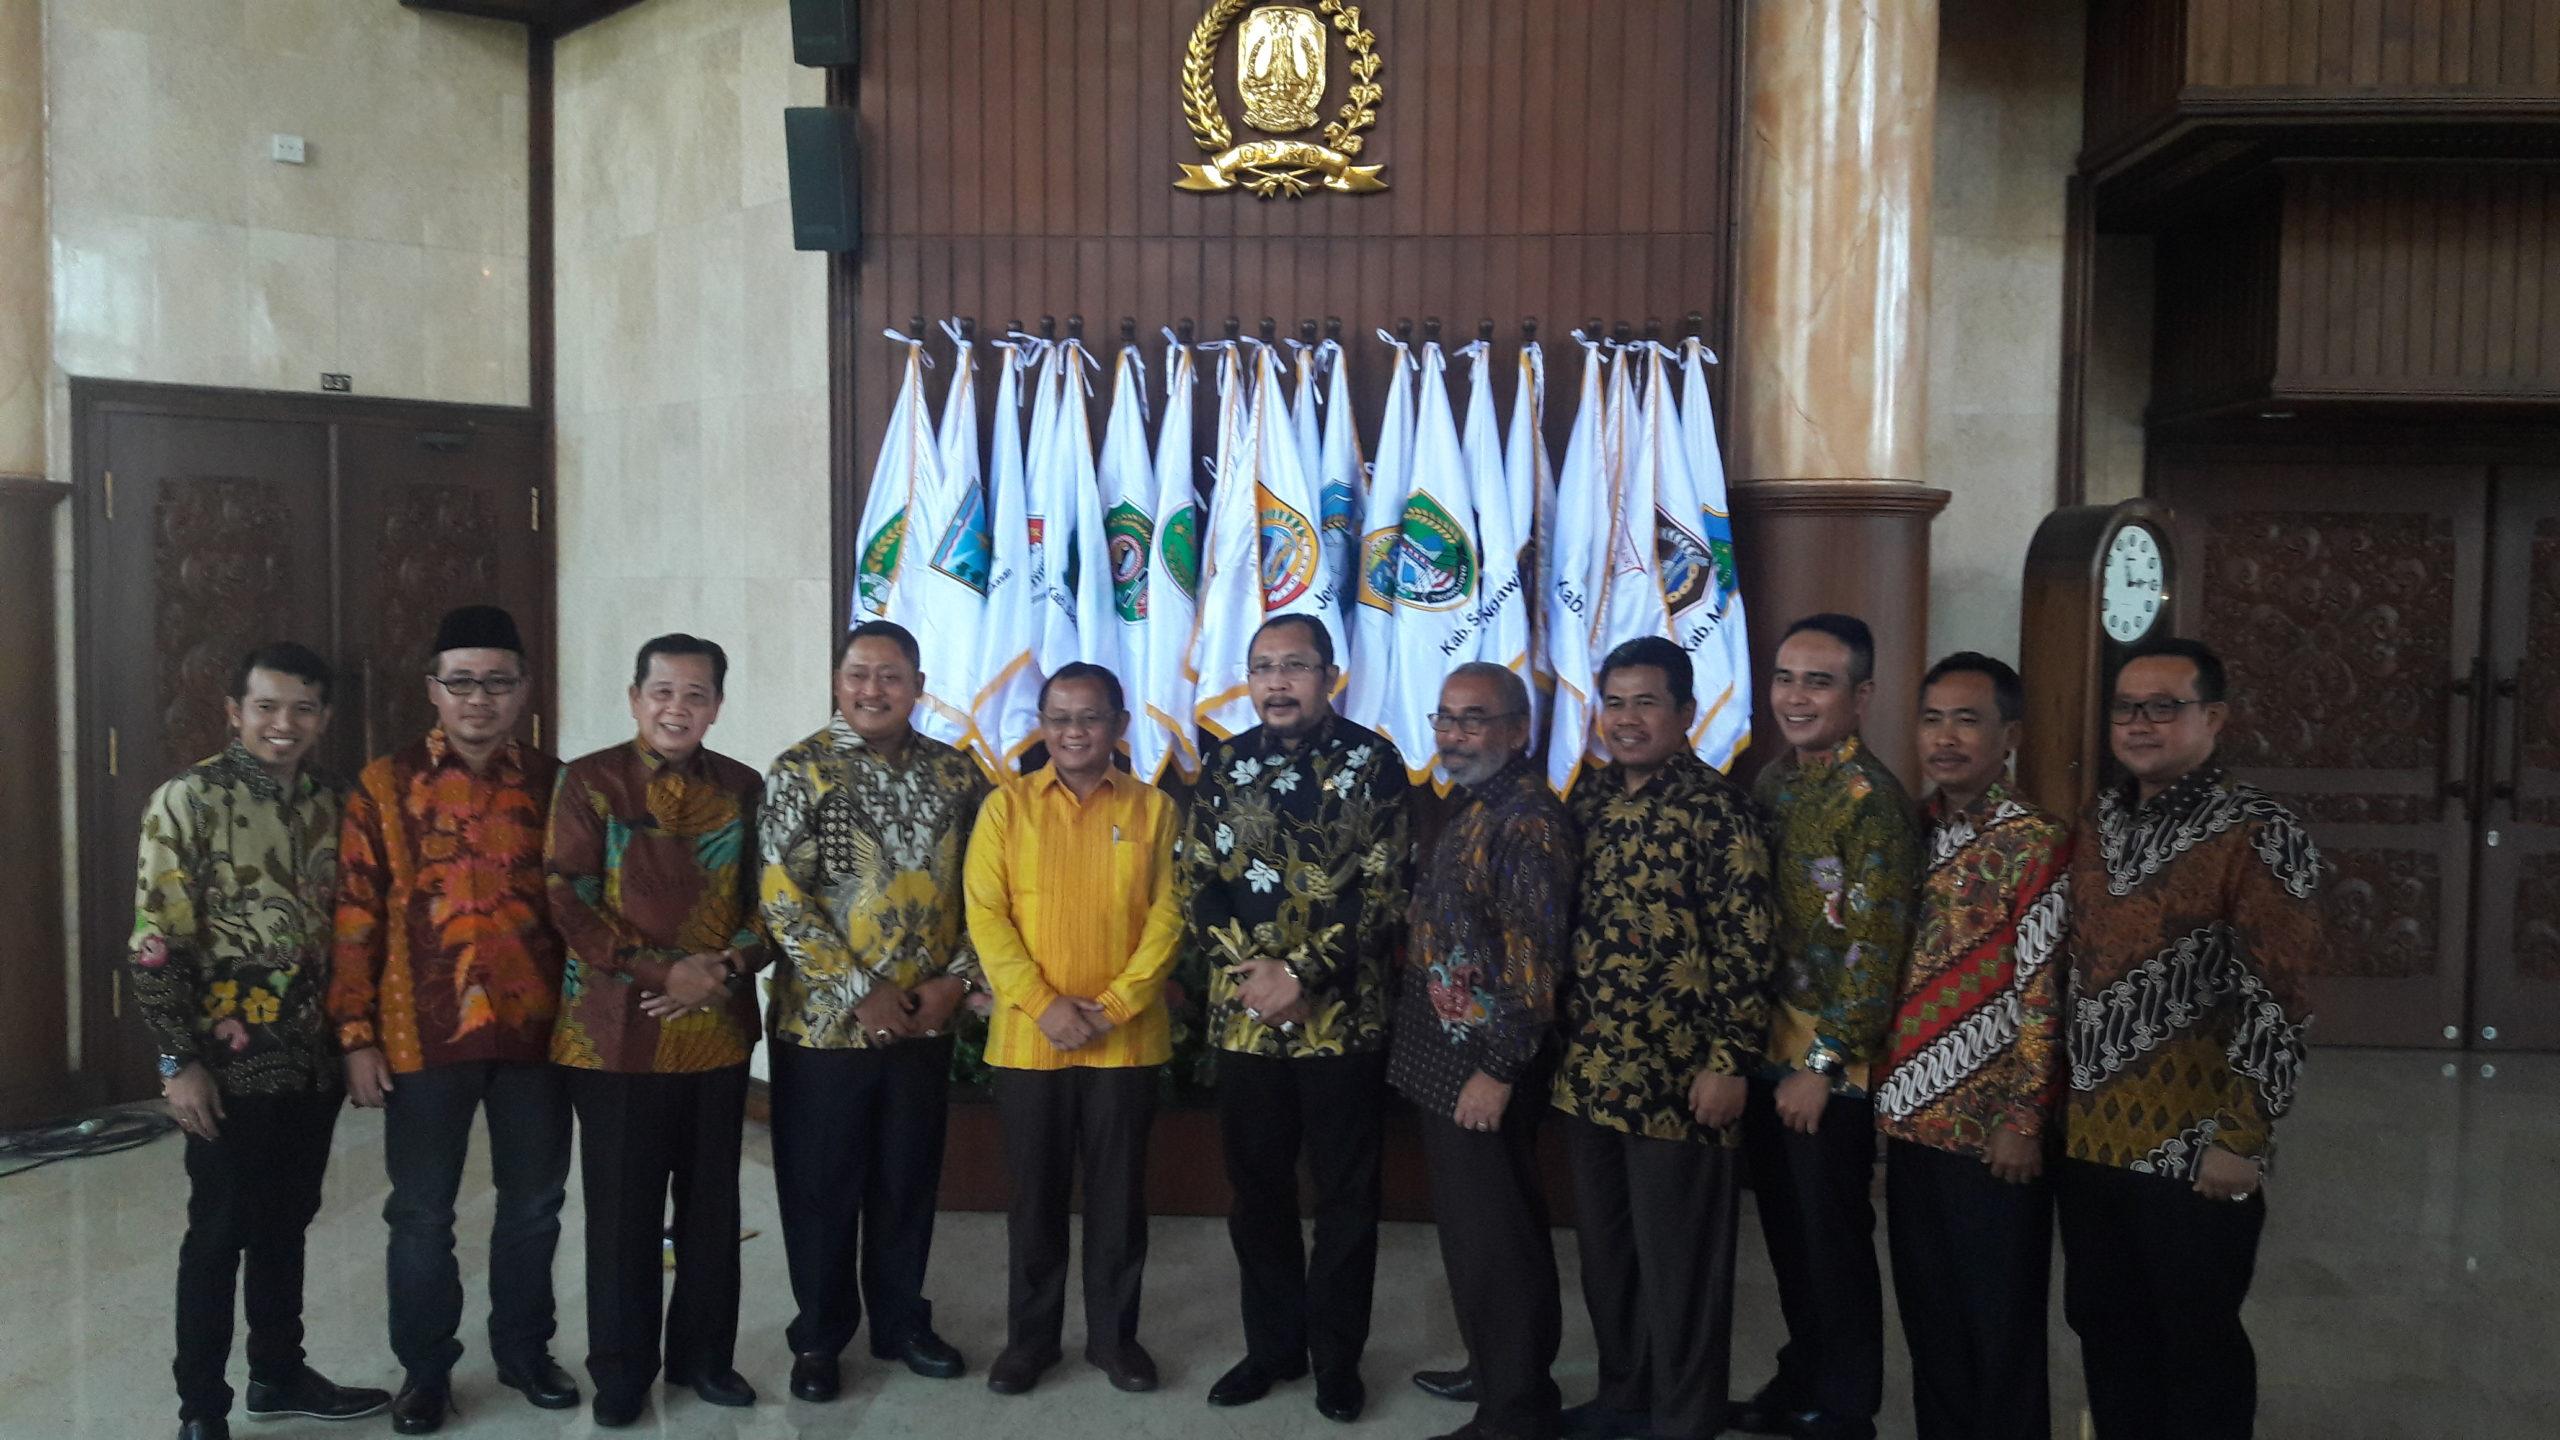 Terpilih sebagai Ketua Golkar Jatim dalam Musda ke X di Surabaya, Sarmudji temui fraksi Golkar DPRD Jatim. (foto :nusantaranews.co /Setya)